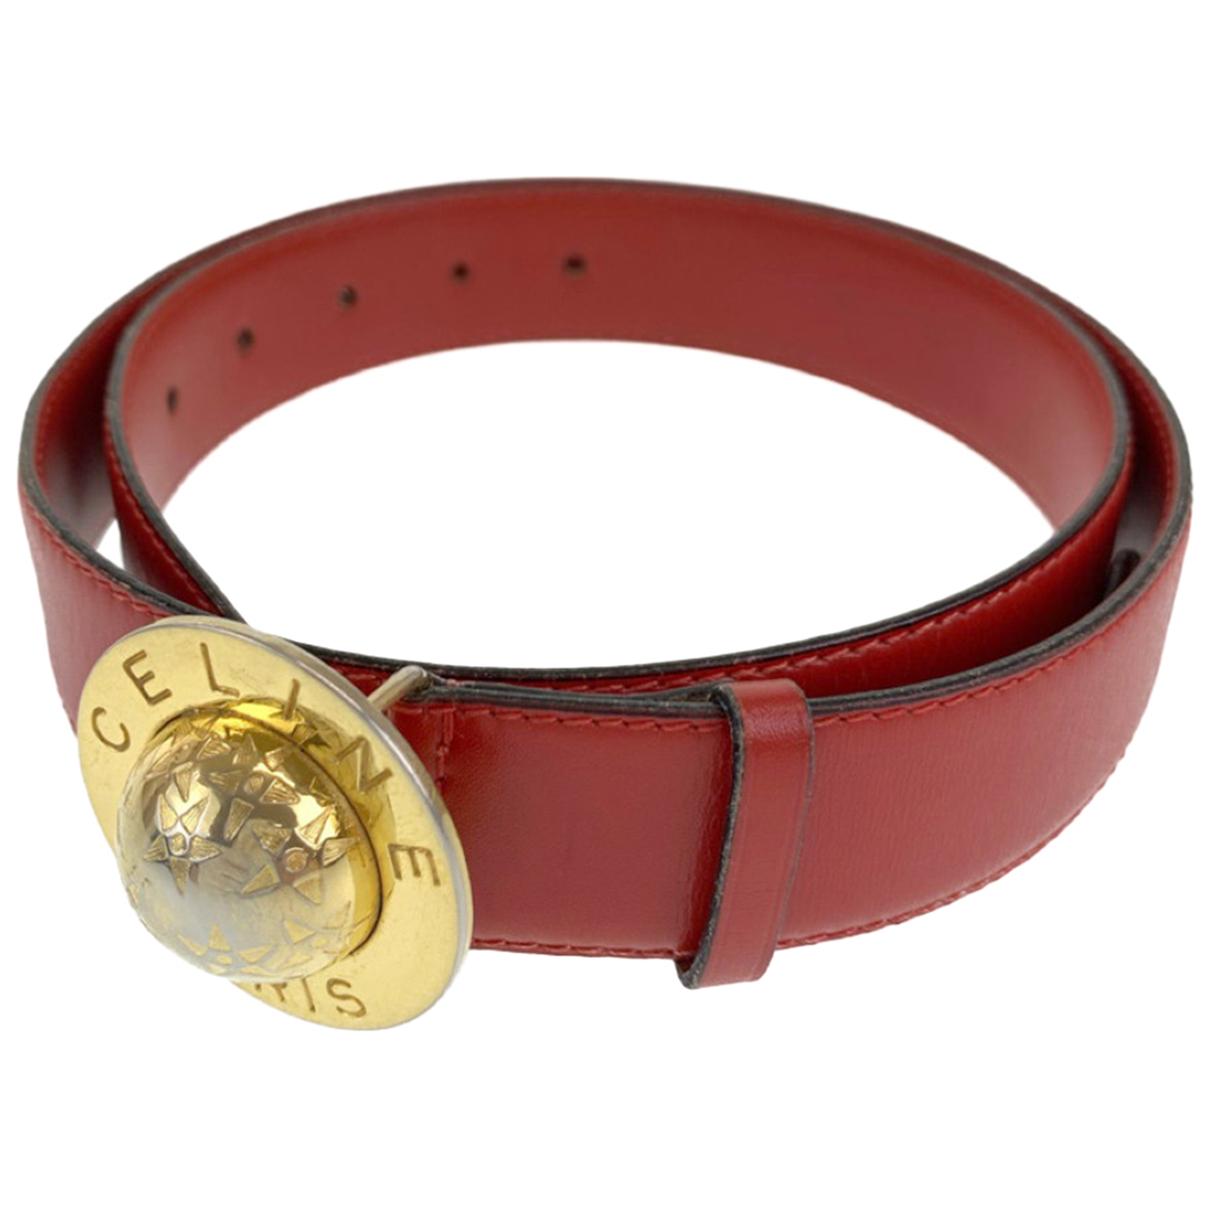 Celine N Leather belt for Women 80 cm